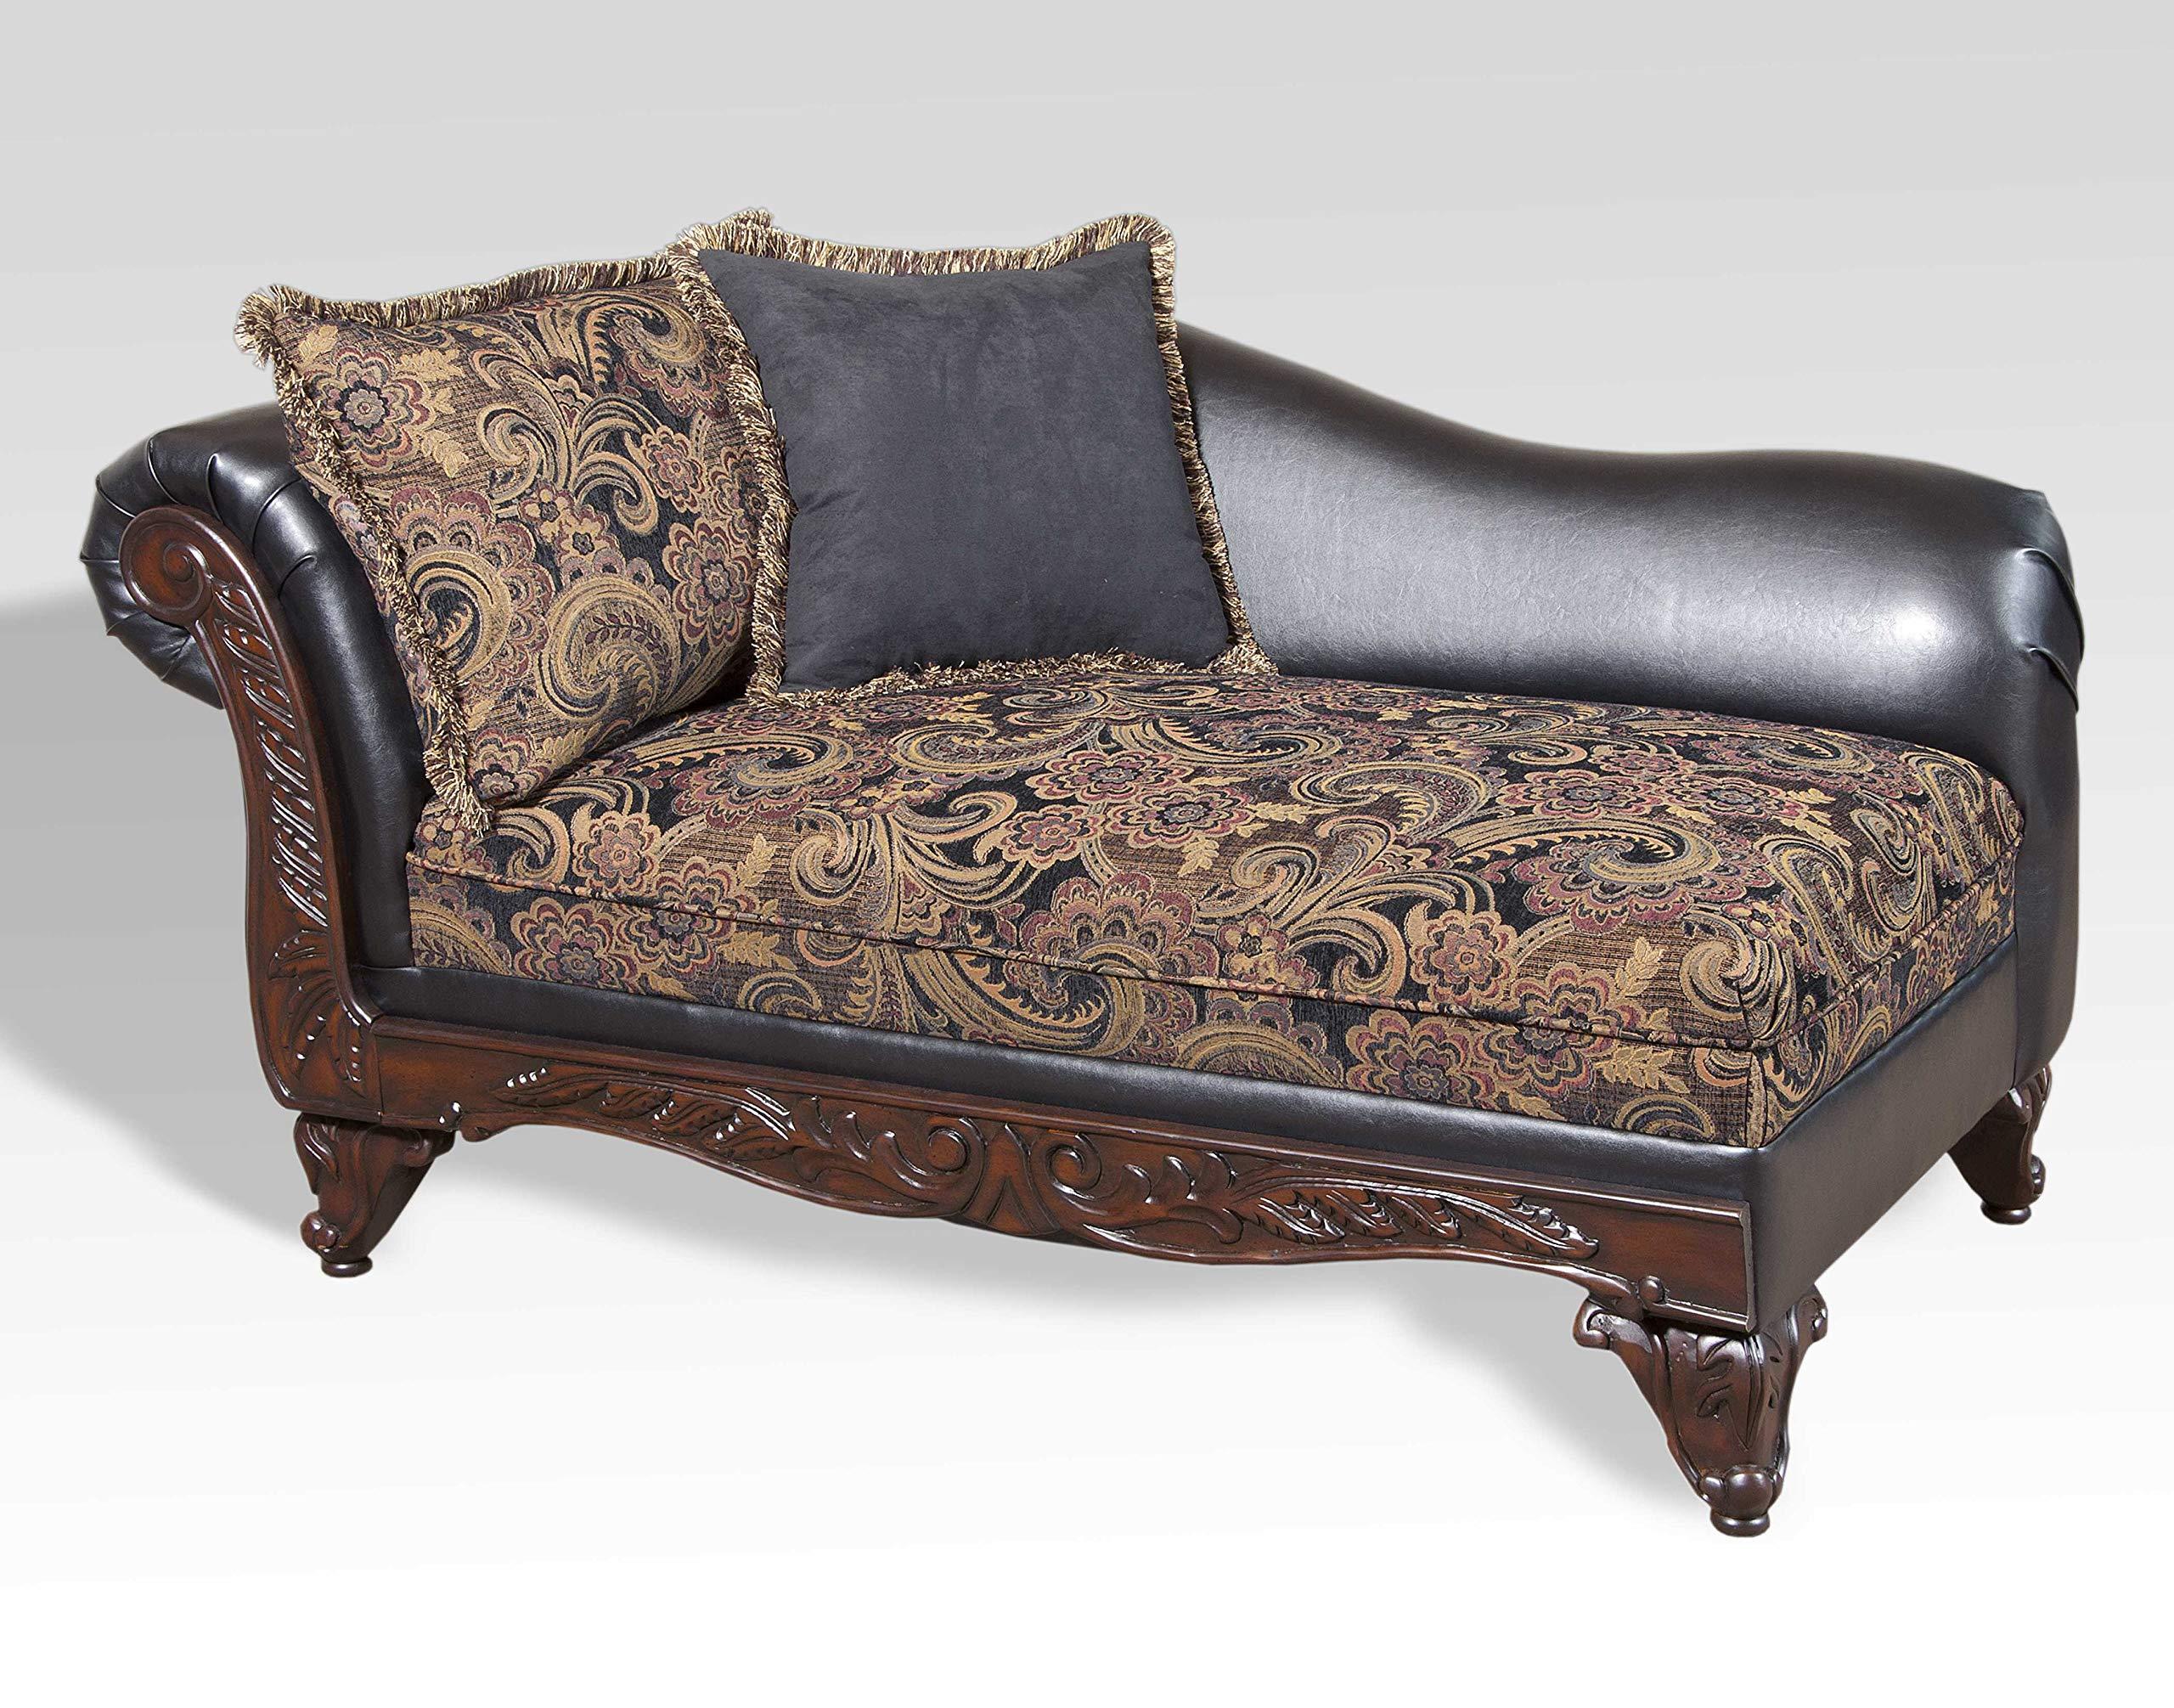 Roundhill Furniture San Marino 2-Tone Fabric Chaise, Chocolate by Roundhill Furniture